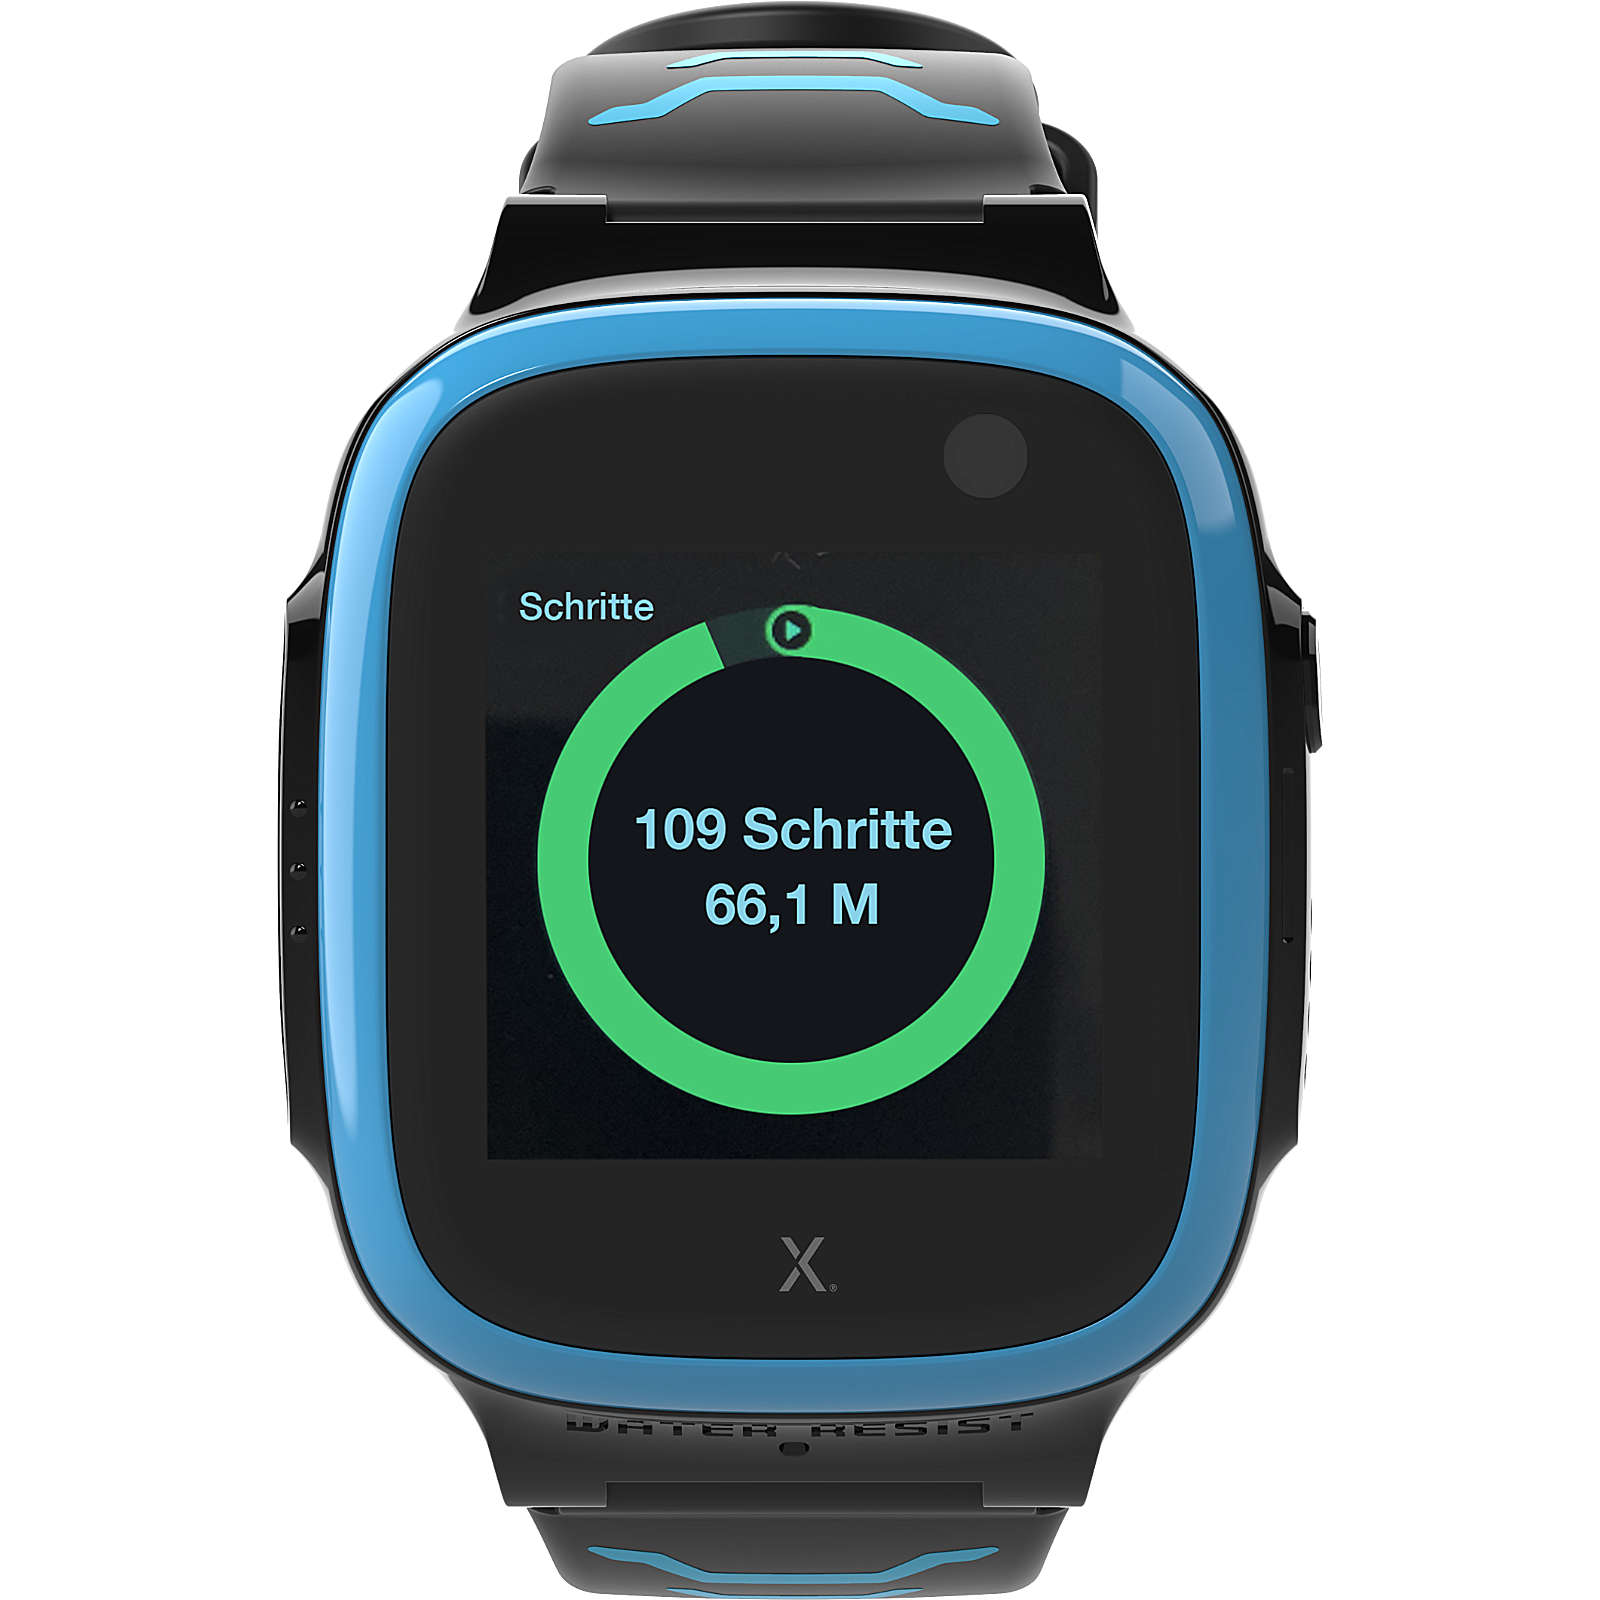 Smartwatch XPLORA 5 Play, Nano SIM, 2 MP Kamera, blau blau